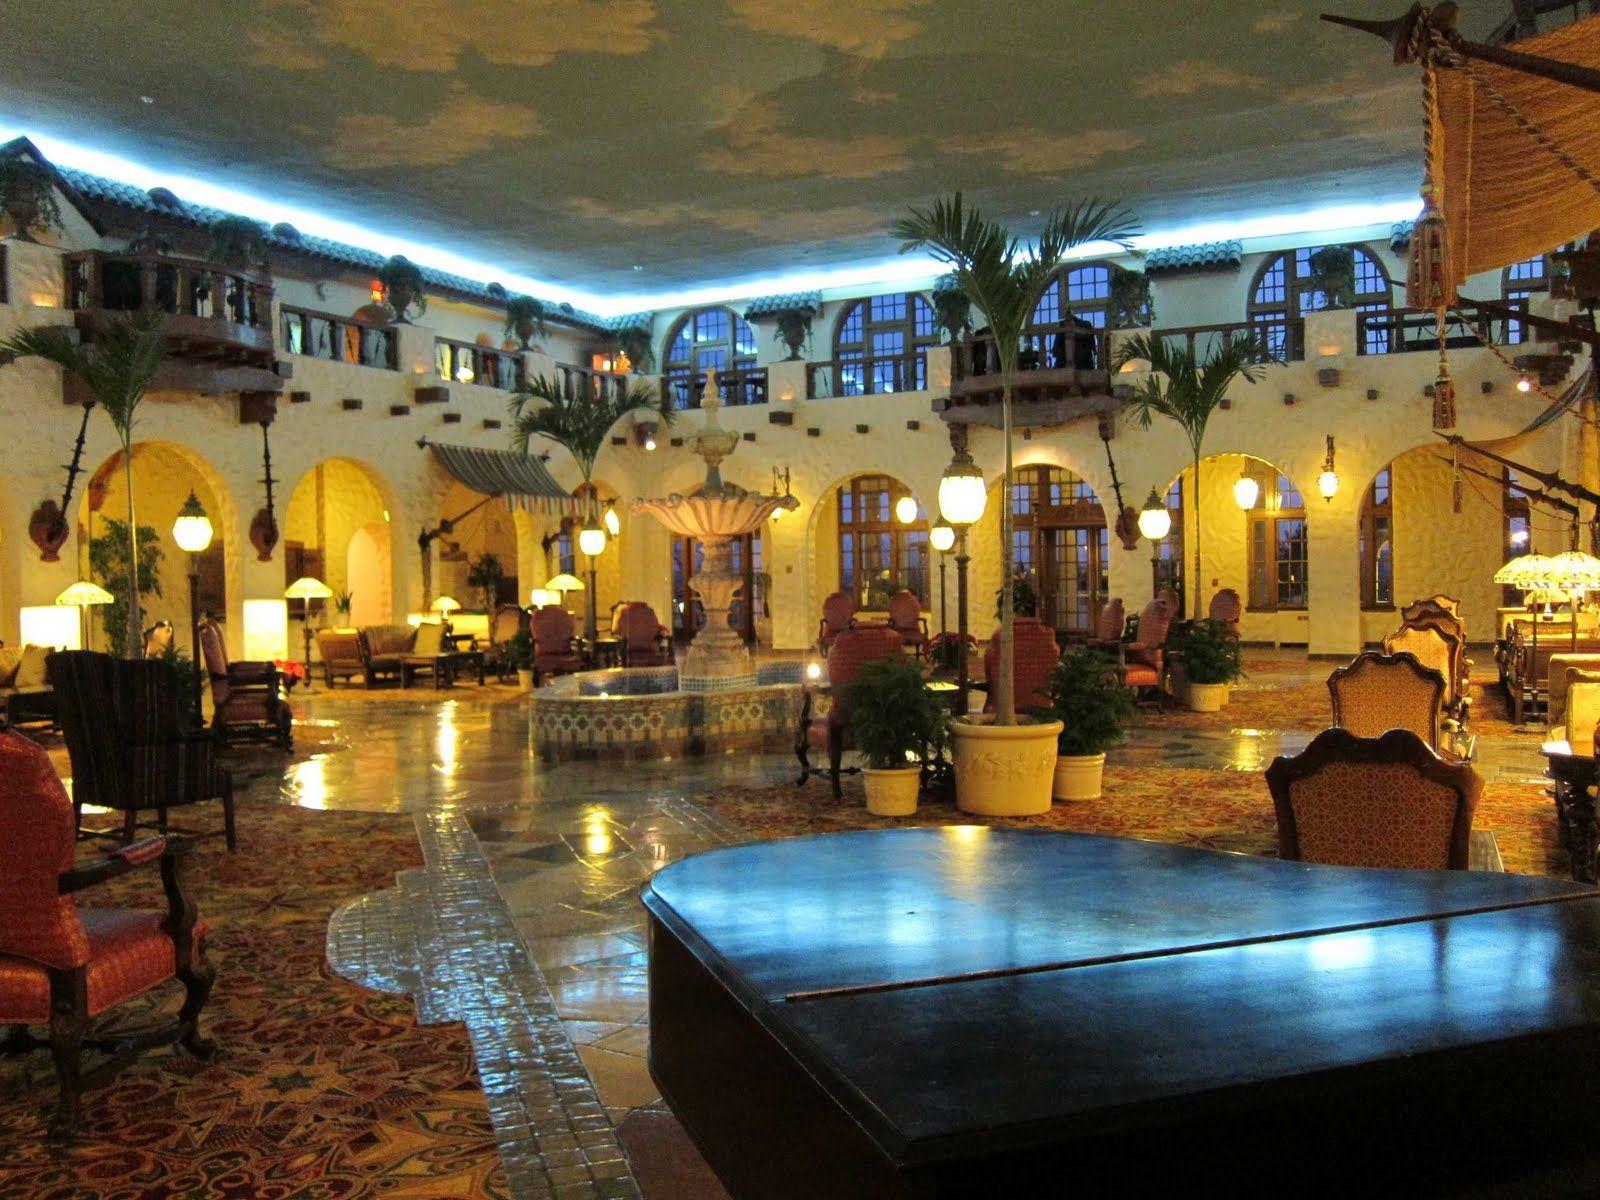 Hershey Hotel Lancaster Pennsylvania